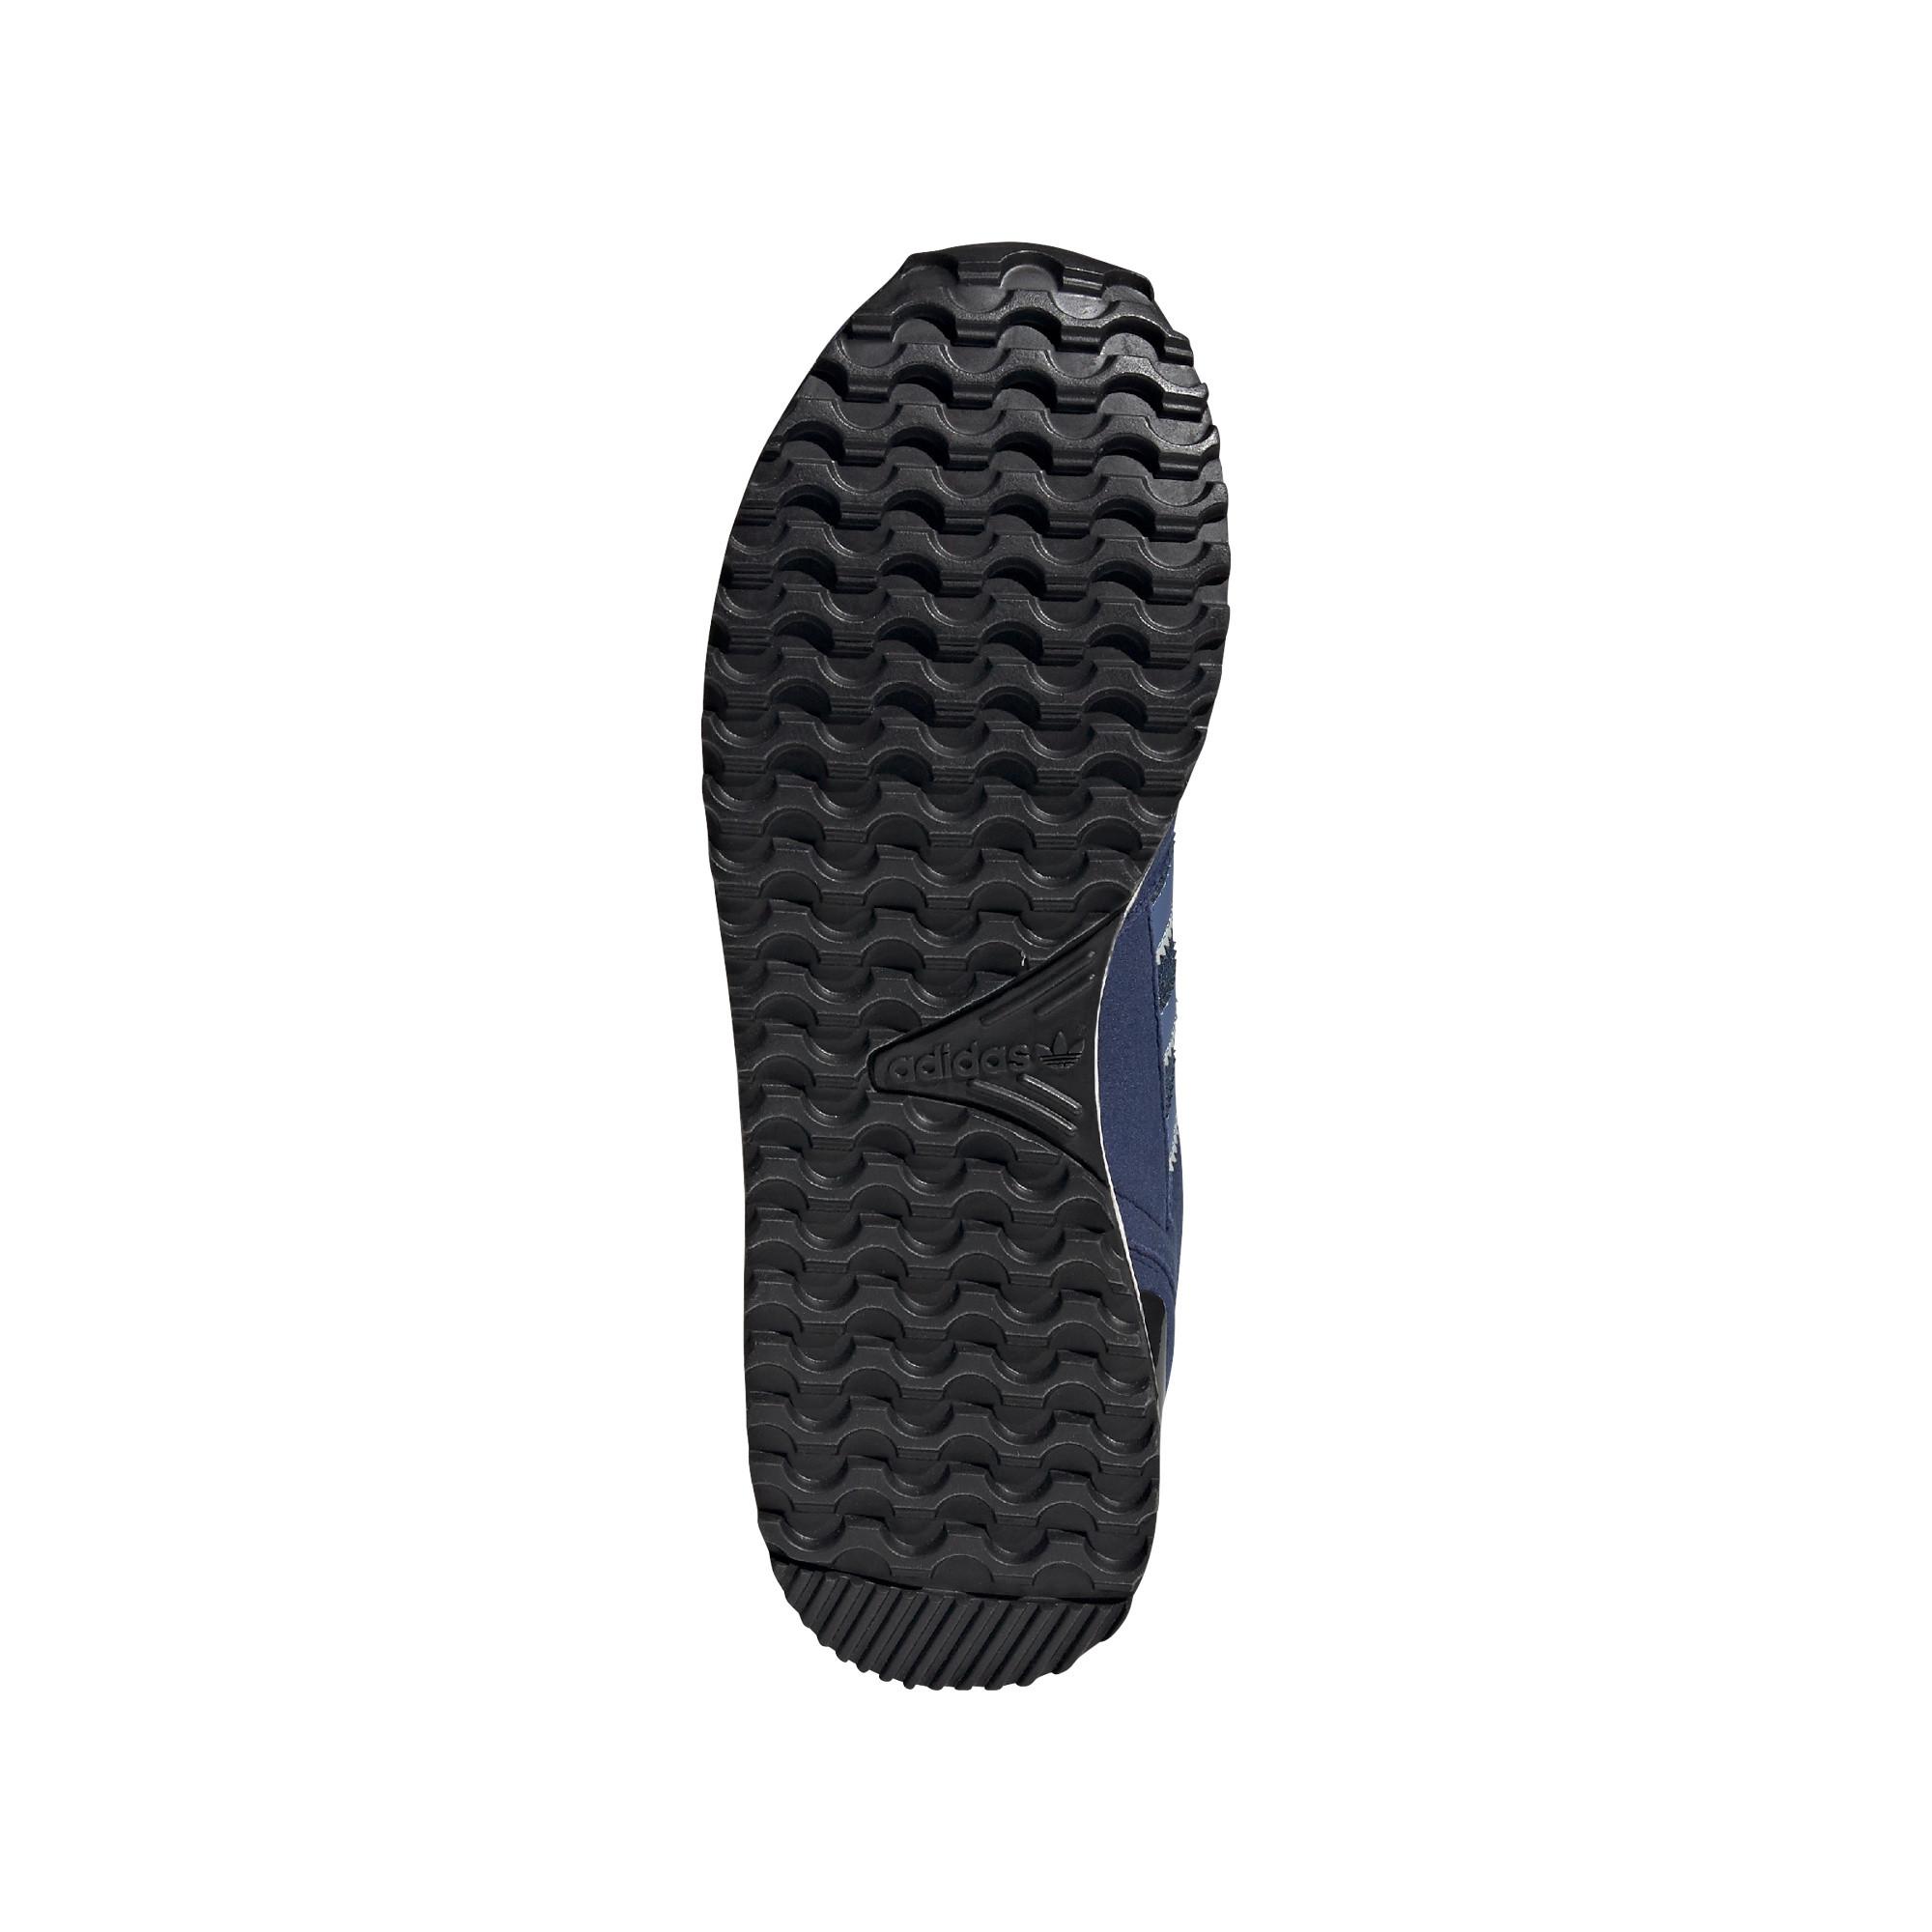 Scarpe uomo ZX 700, Blu scuro, large image number 1